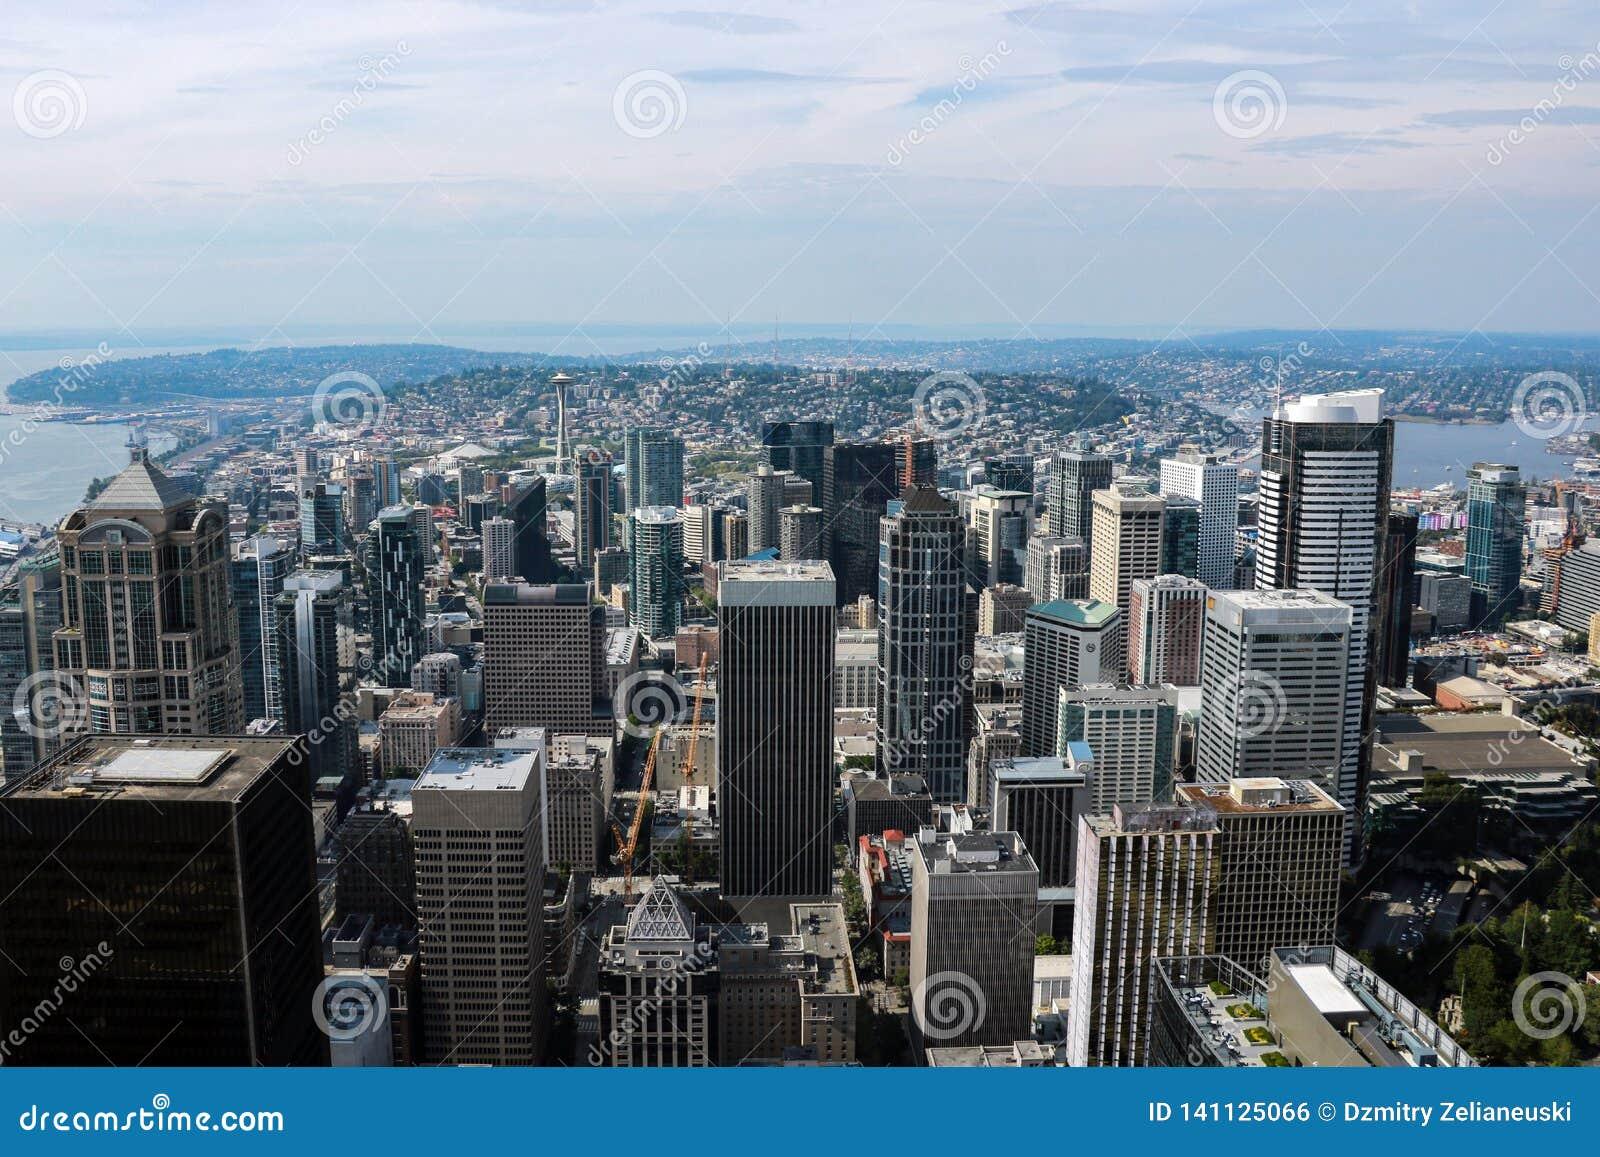 Seattle, EUA, o 31 de agosto de 2018: Vista panorâmica aérea da arquitetura da cidade de Seattle